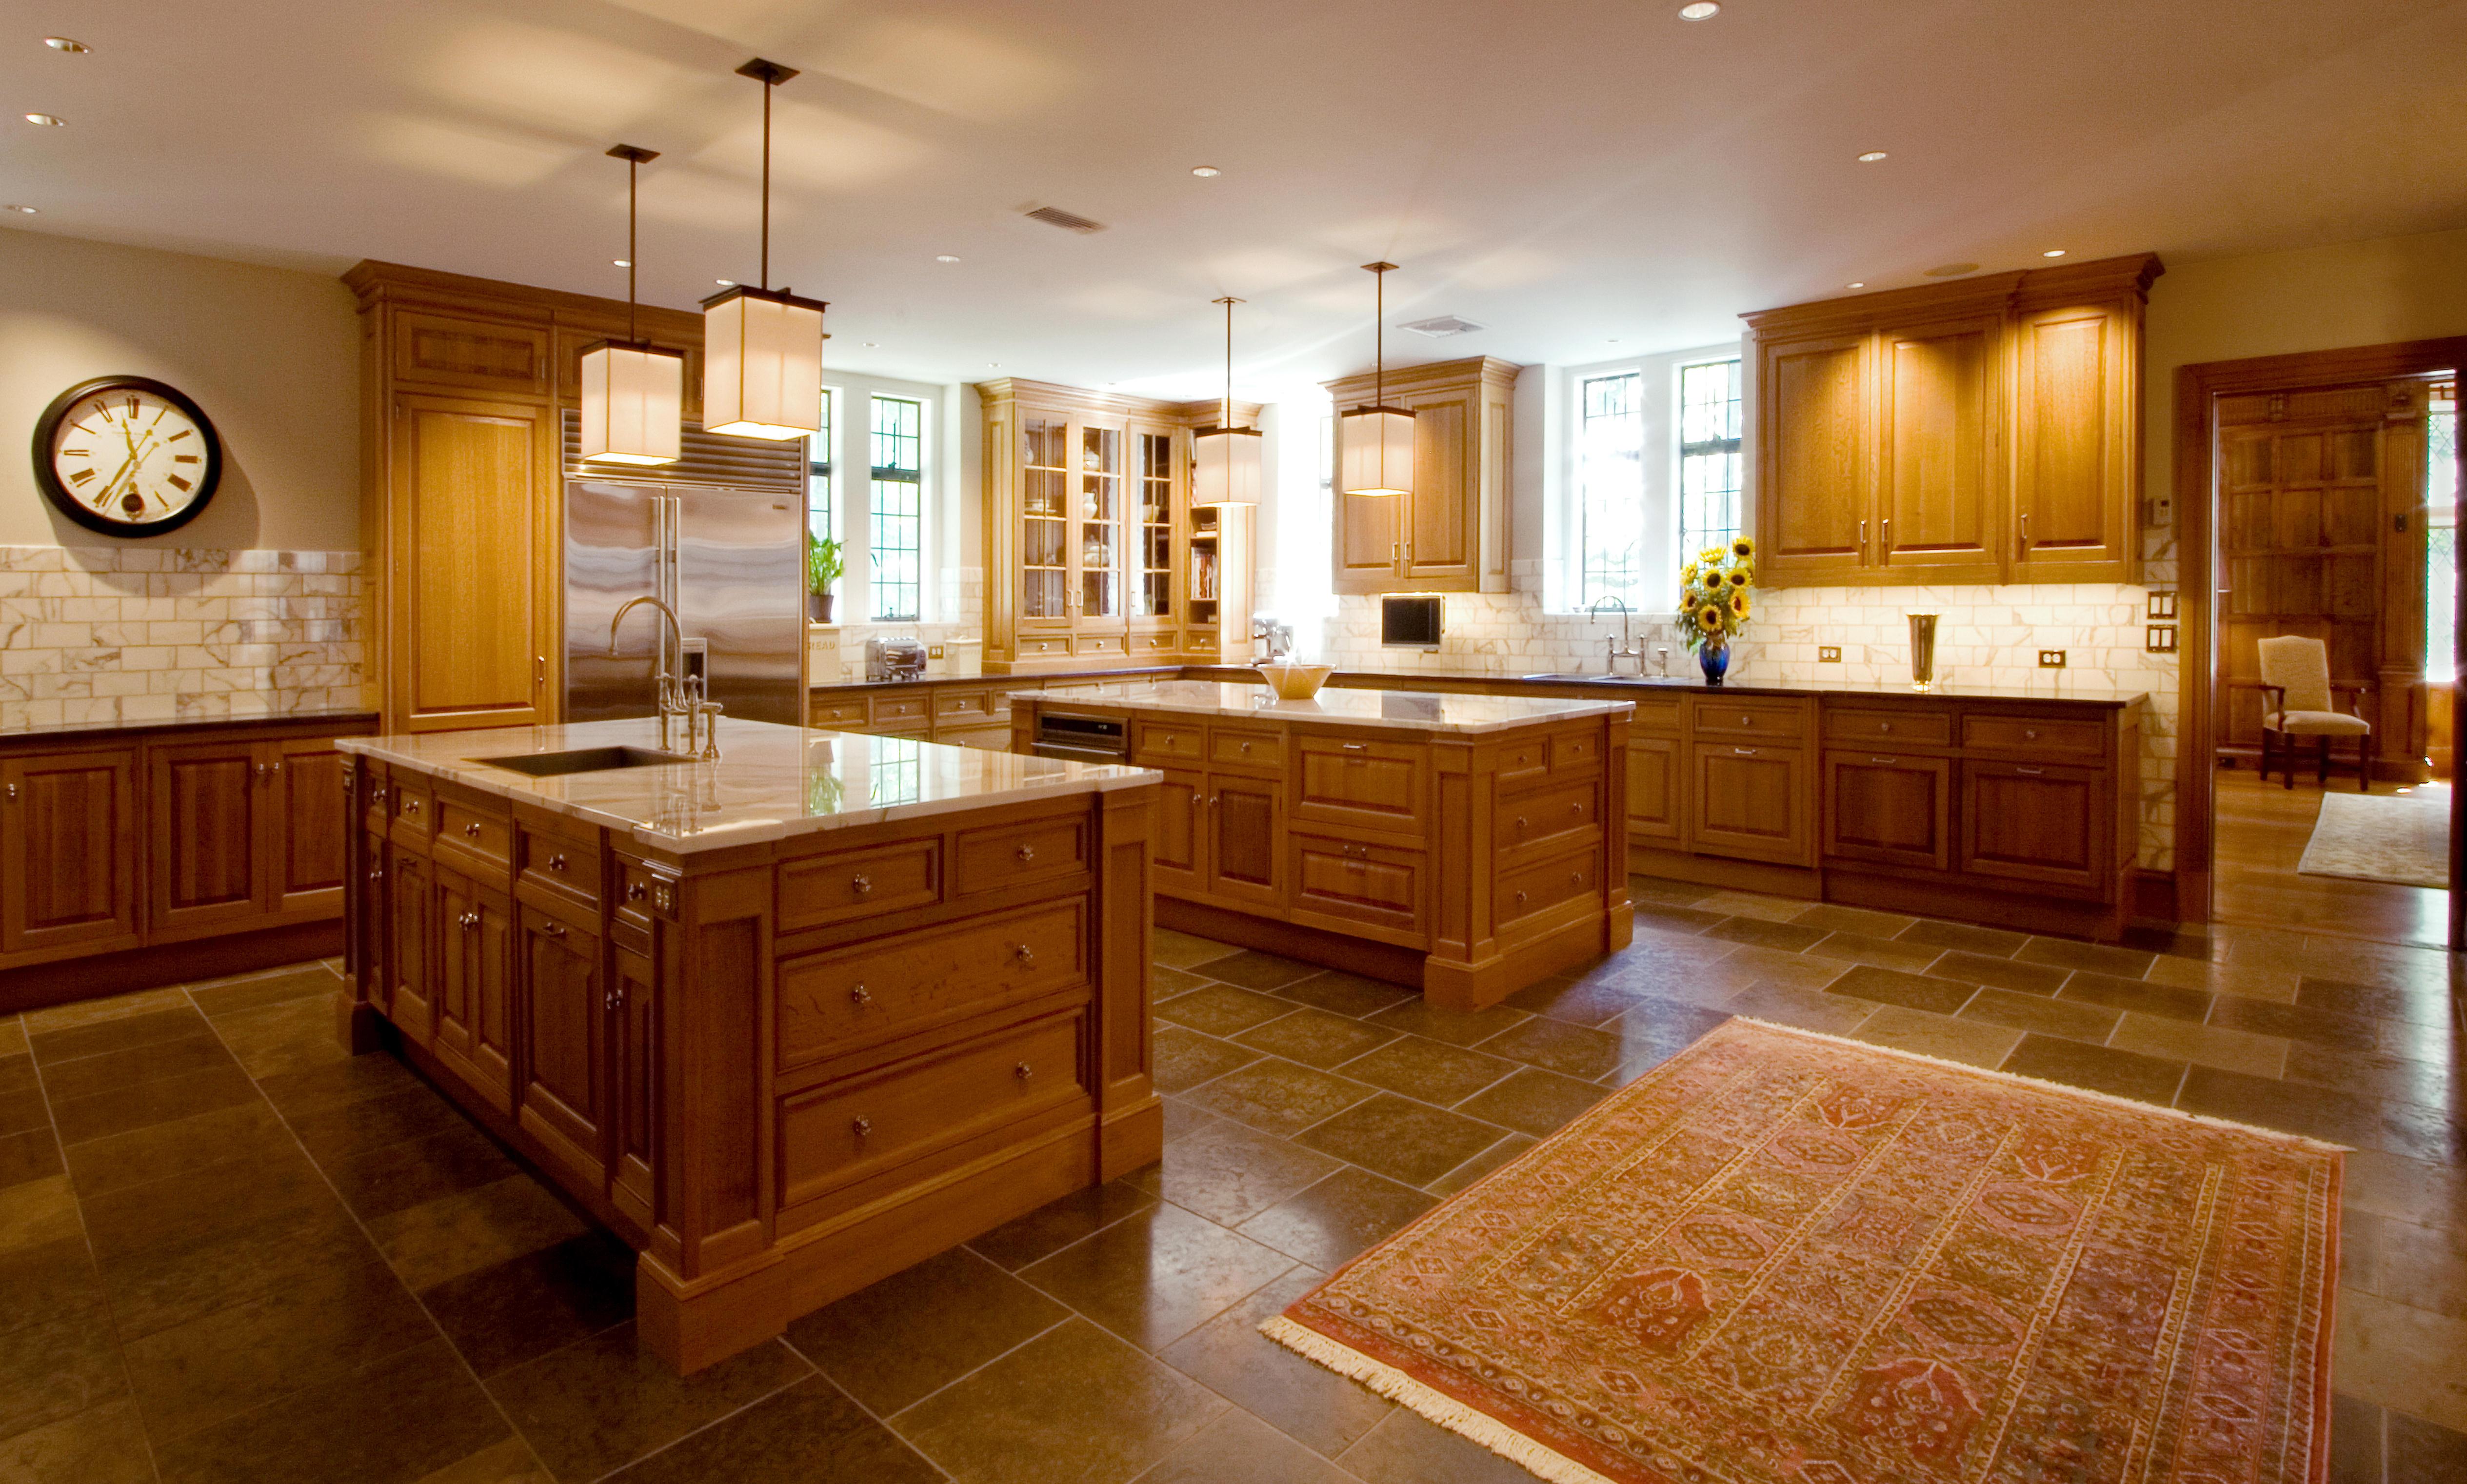 Portable kitchen island bar – Kitchen ideas